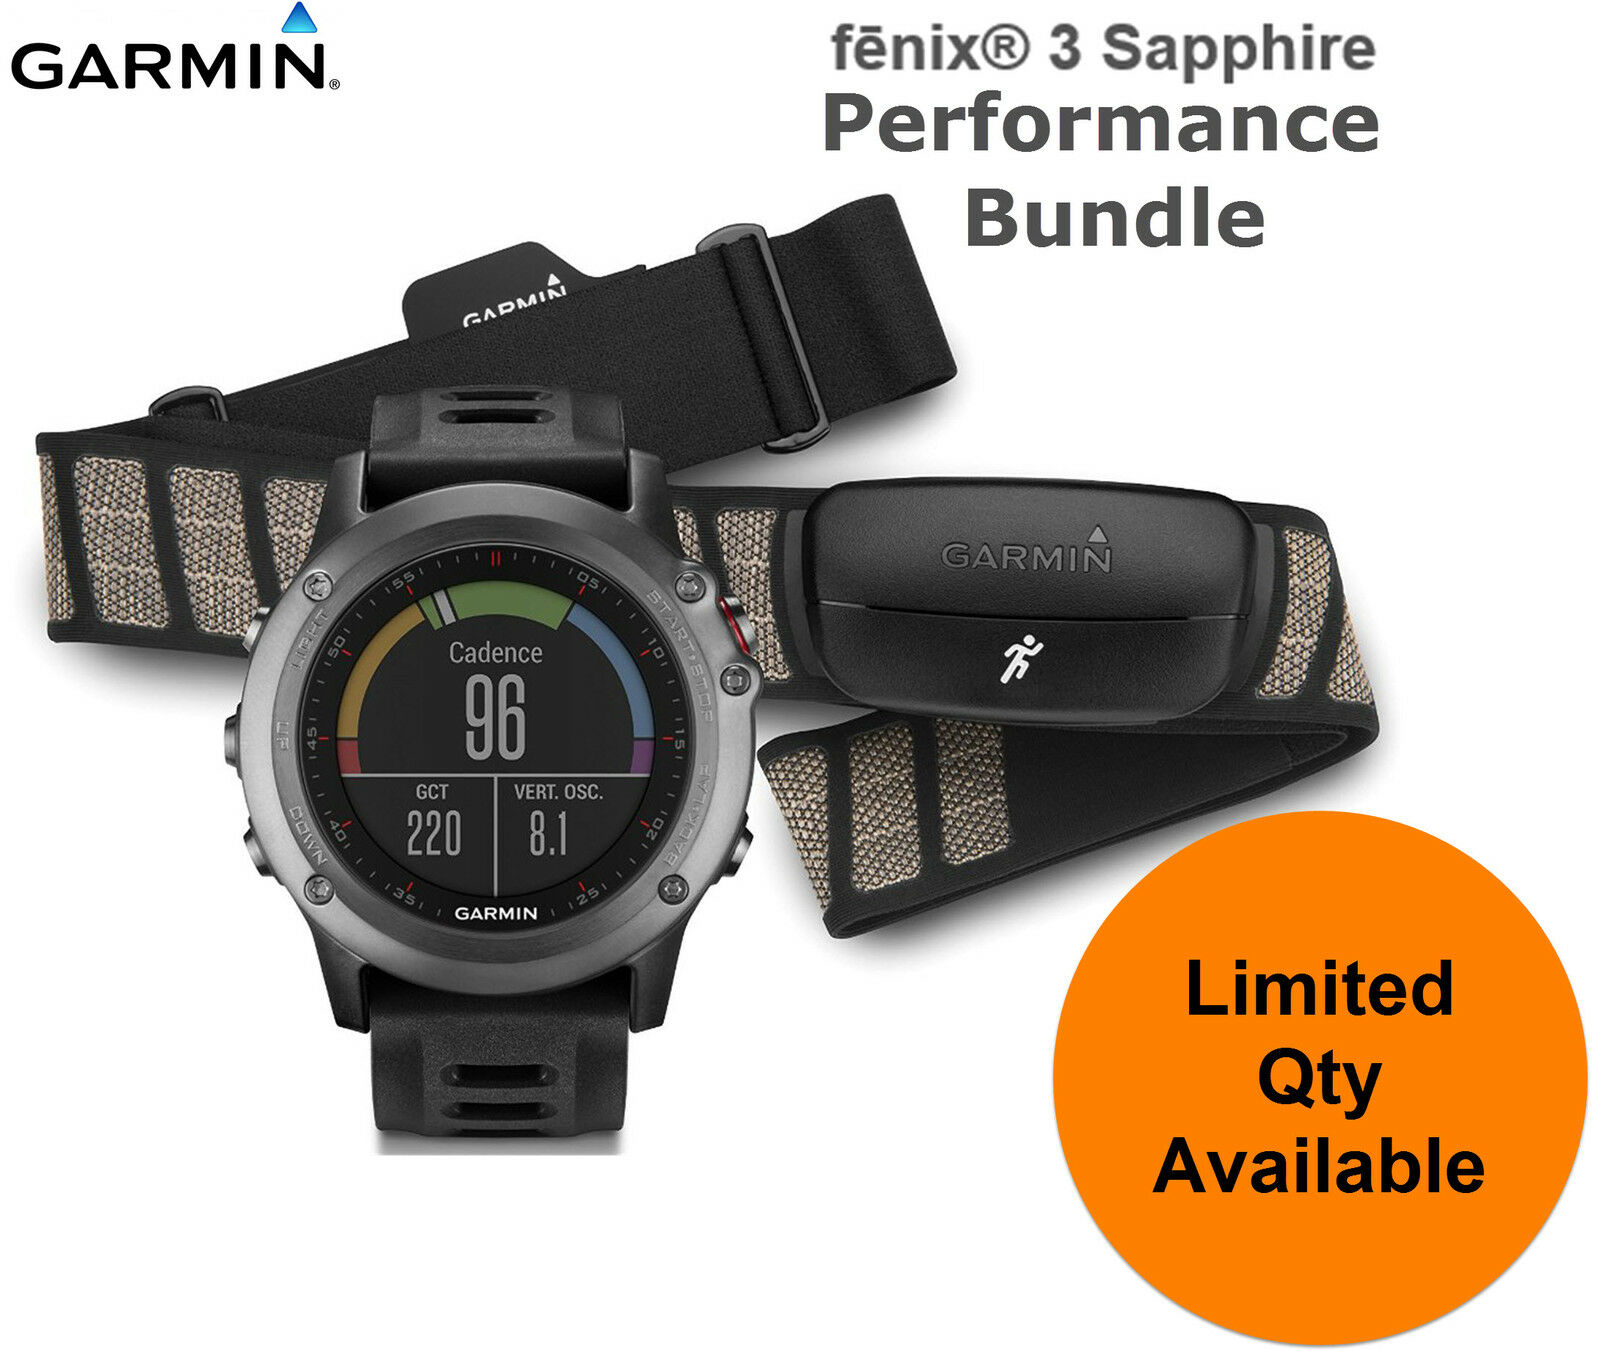 Paquete de rendimiento Garmin Fenix 3 GPS Reloj Sports Running HRM Zafiro Monitor